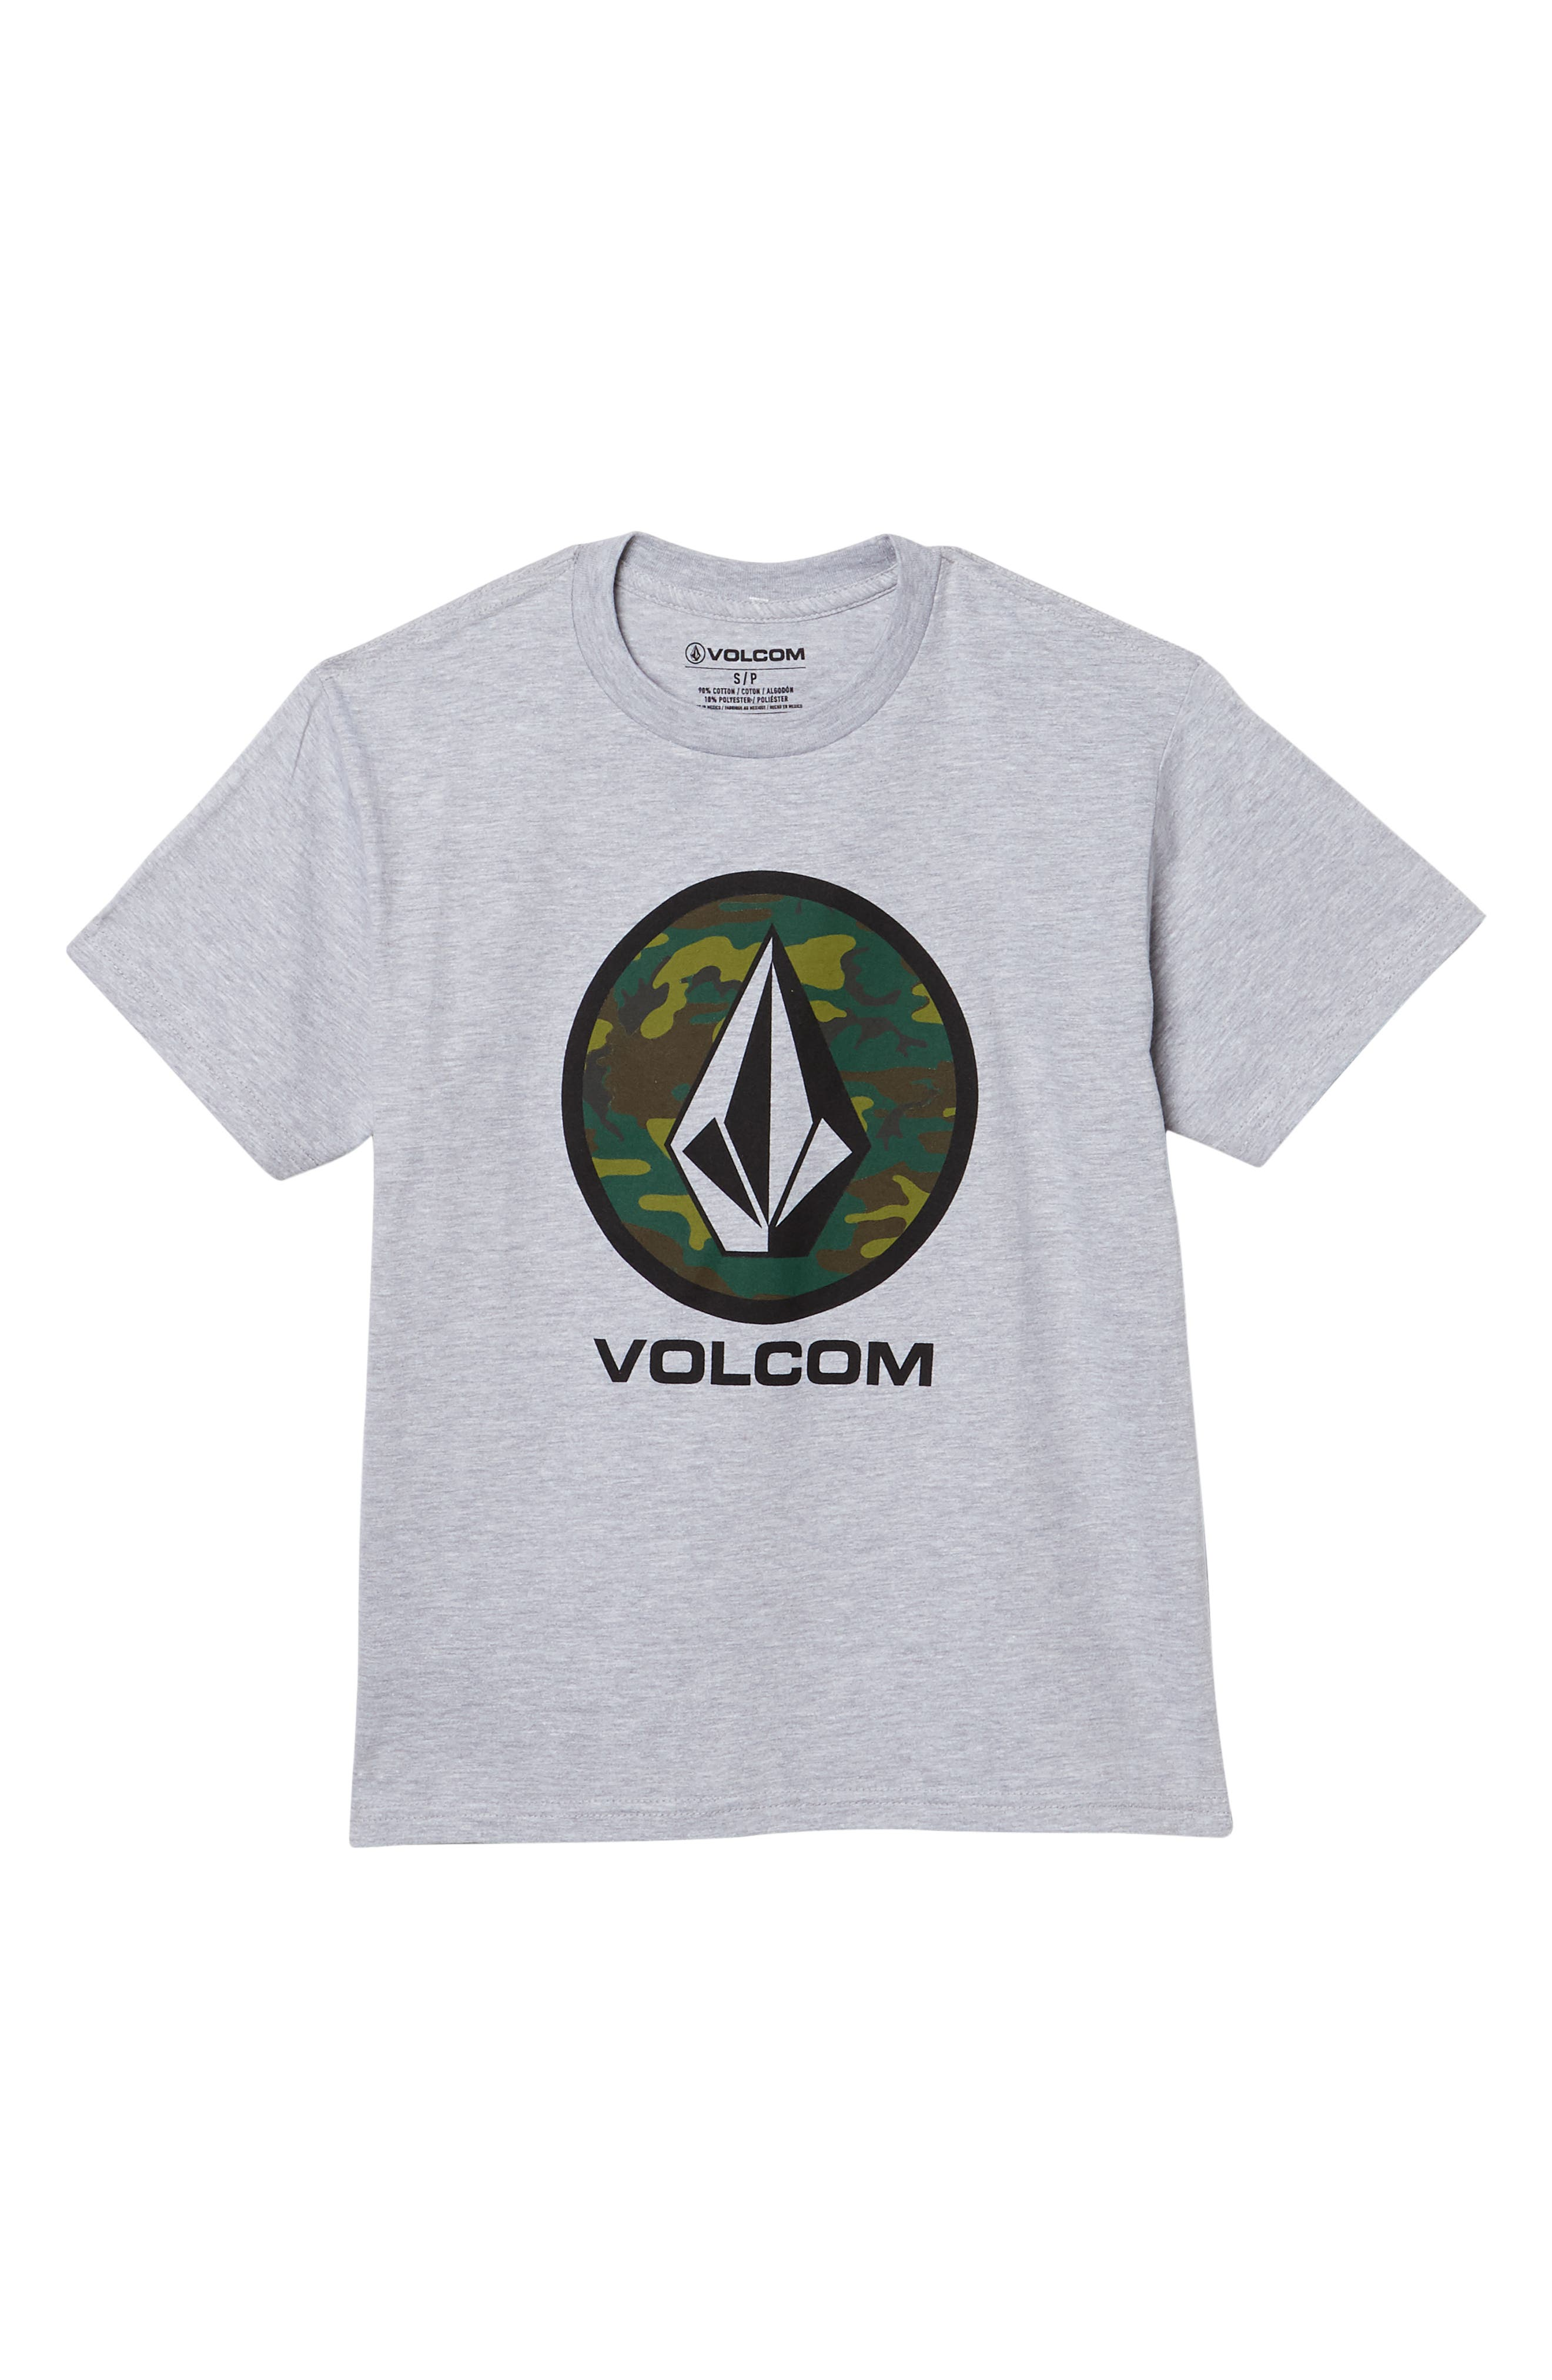 Image of Volcom Camo Stone Graphic T-Shirt